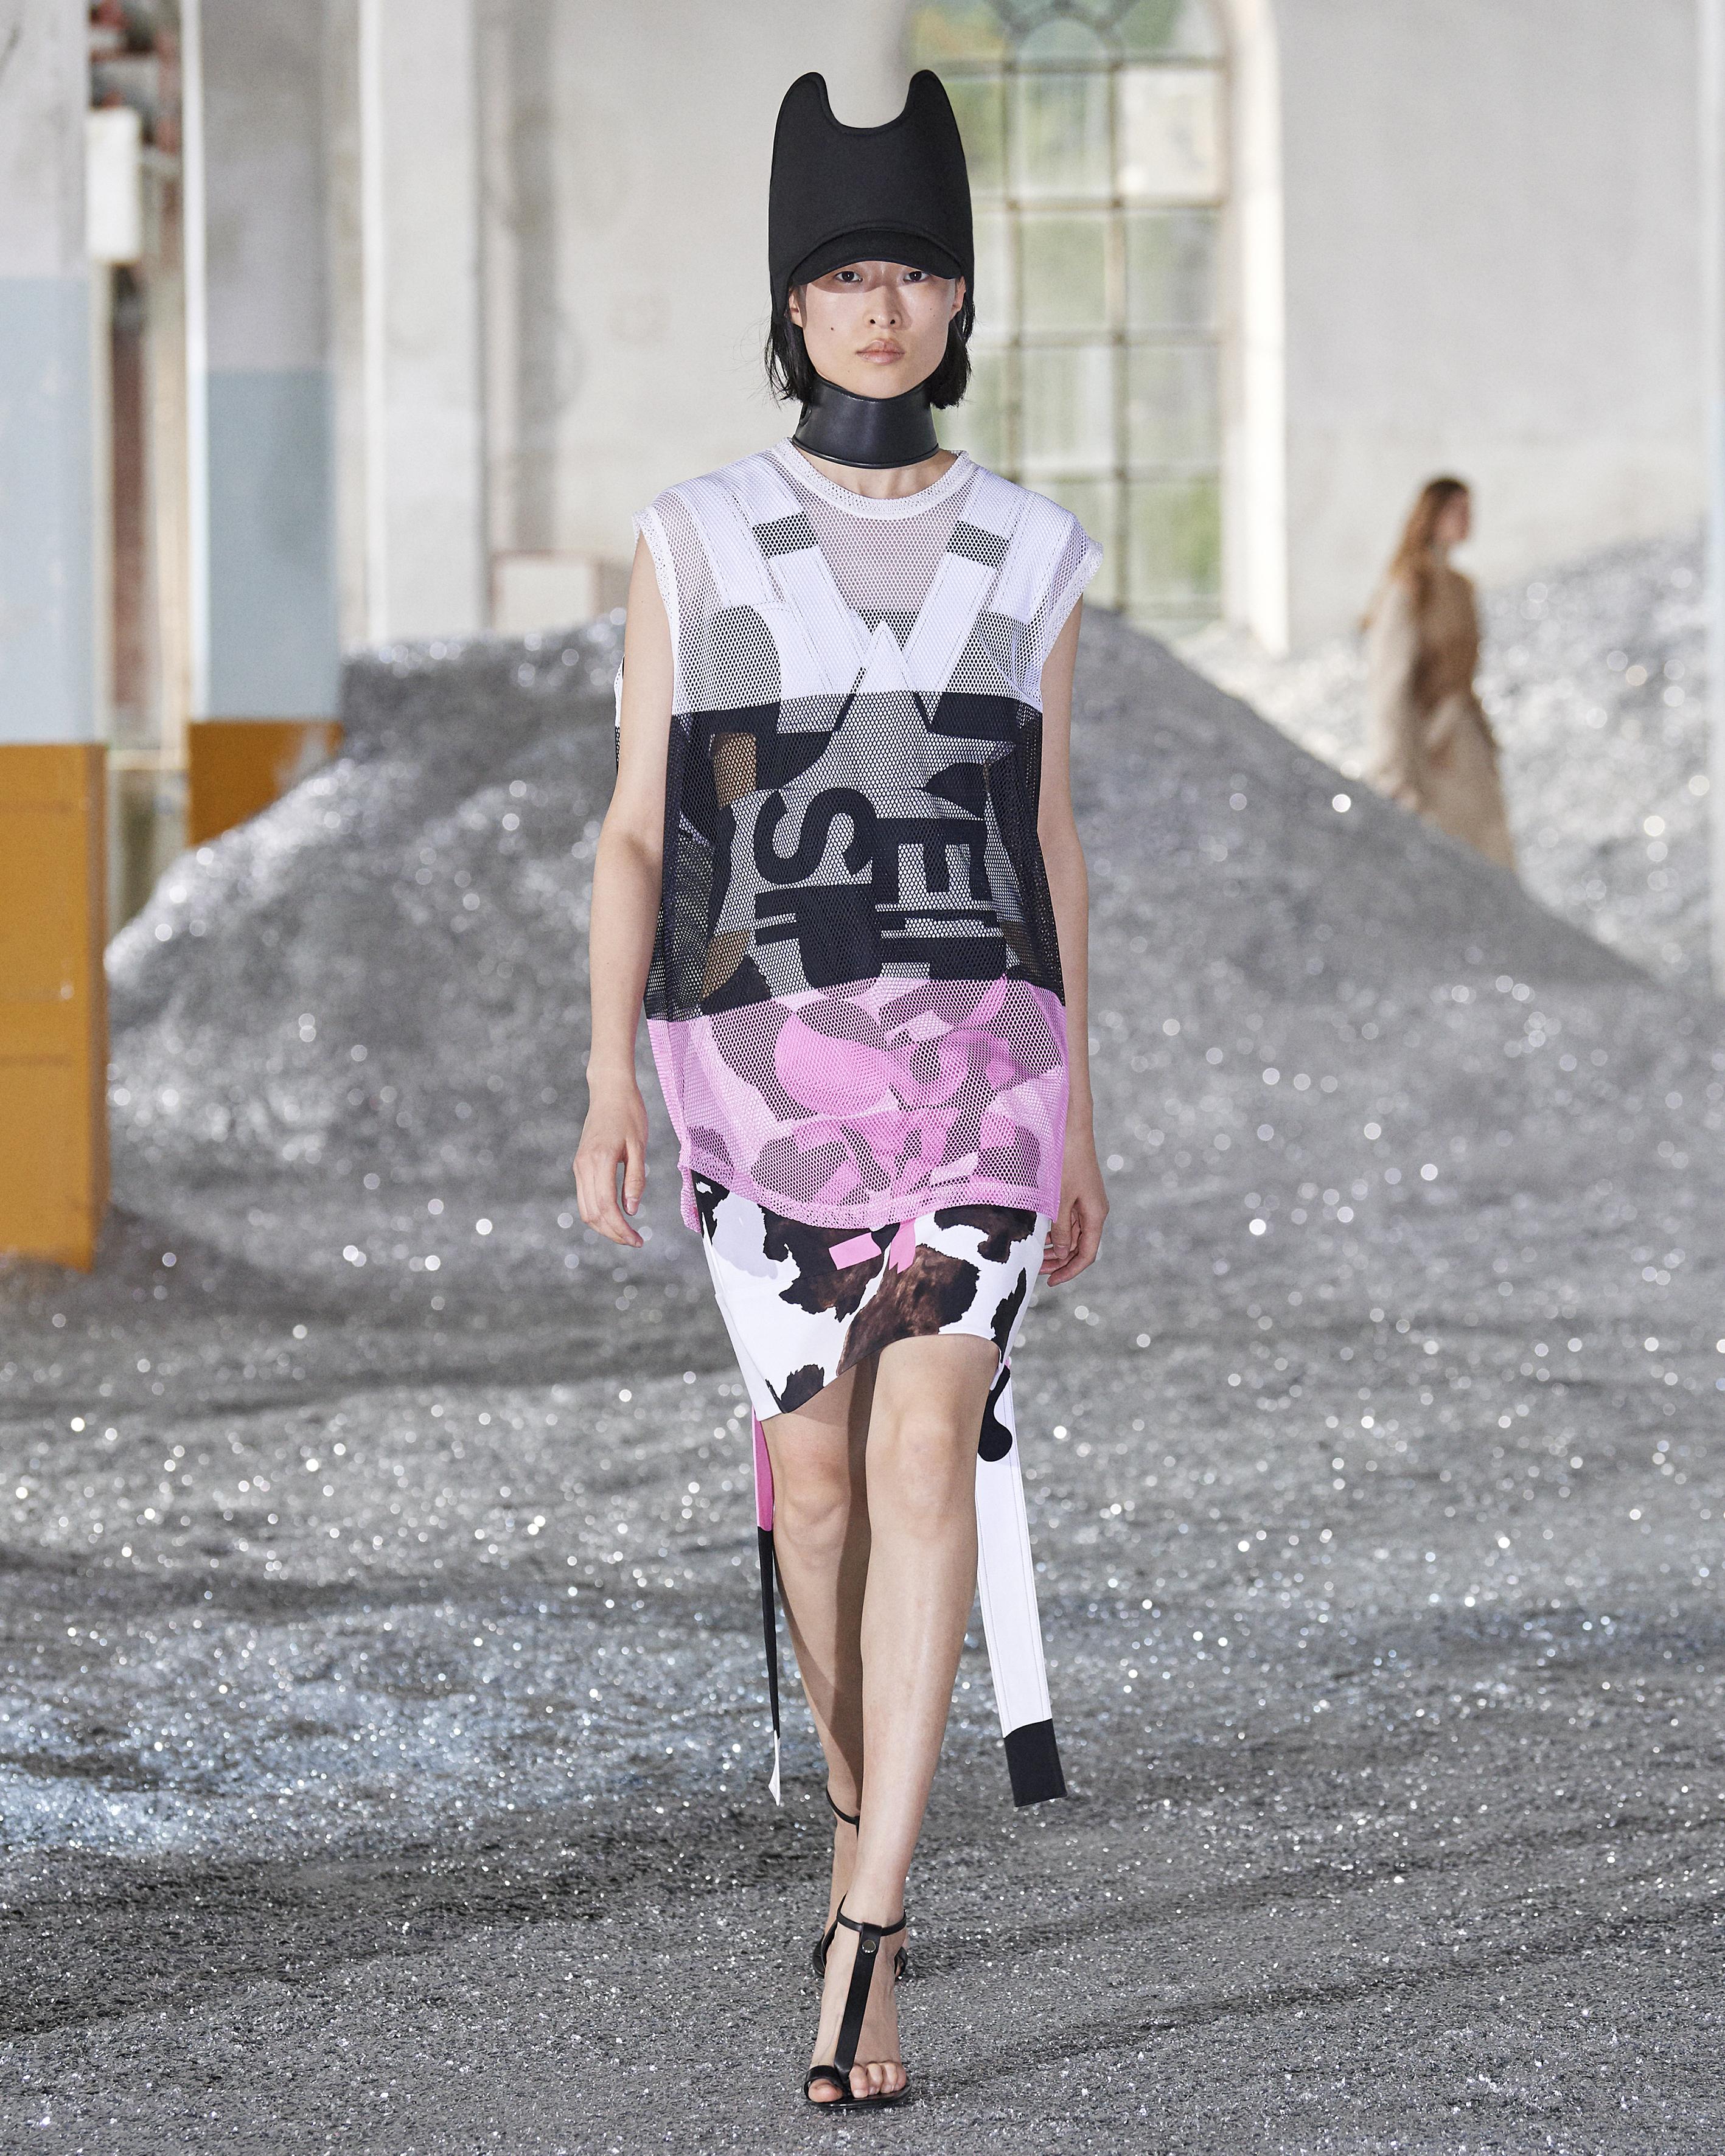 「ANIMAL INSTINCT 动物本能」—Burberry 2022春夏女装系列展示